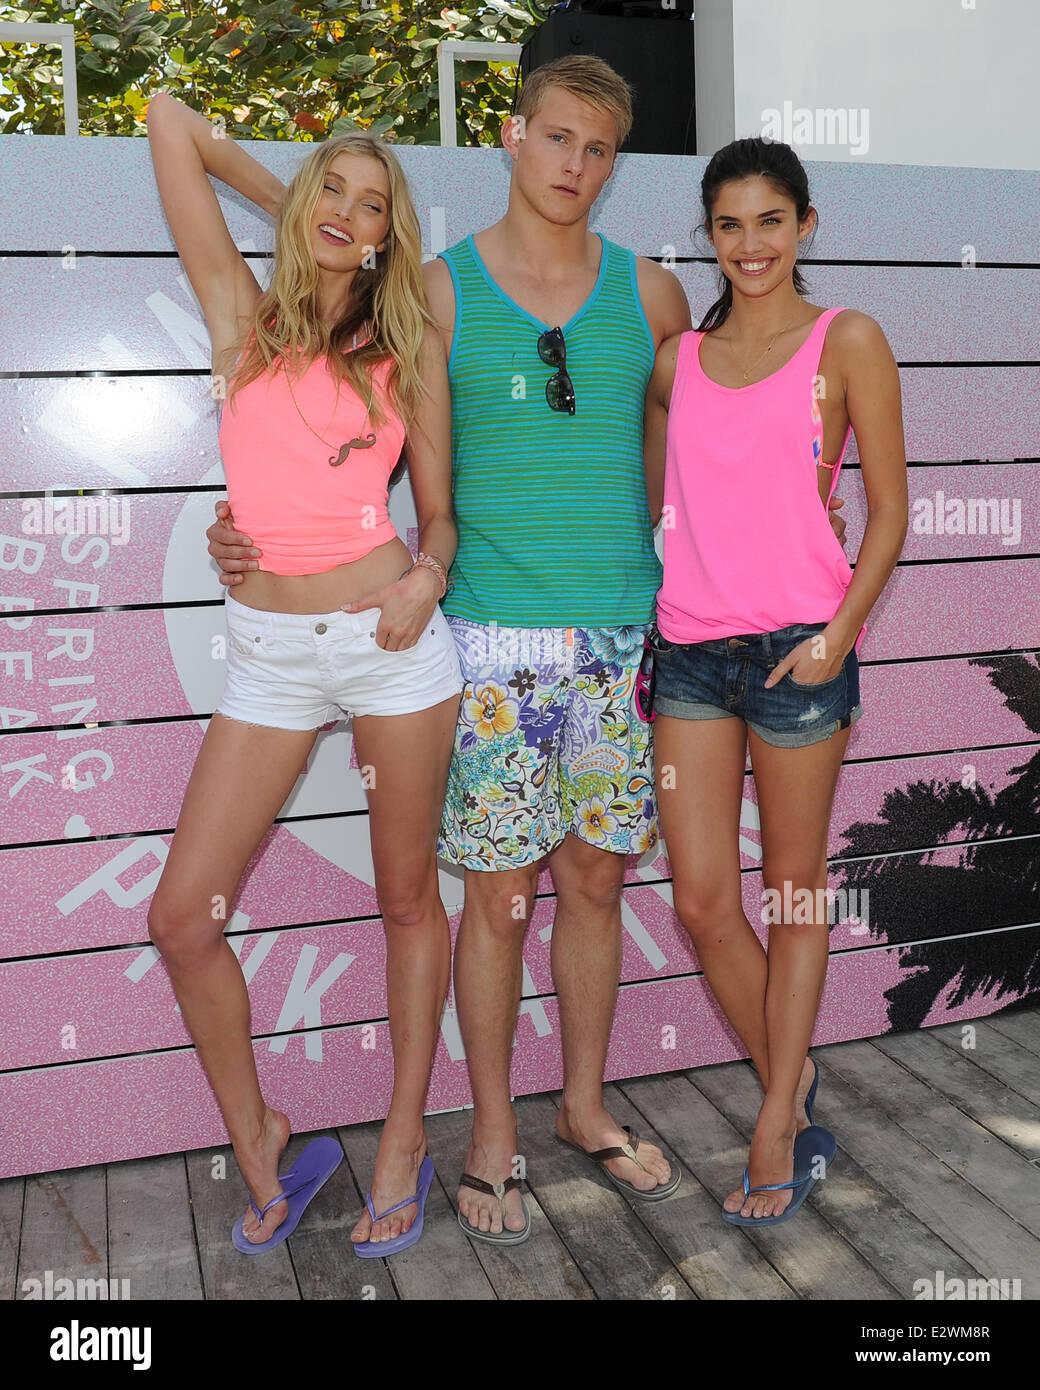 Victorias Secret PINK Brings The Ultimate Spring Break Dance Party To Miami At Raleigh Hotel Featuring Elsa HoskAlexander LudwigSara Sampaio Where